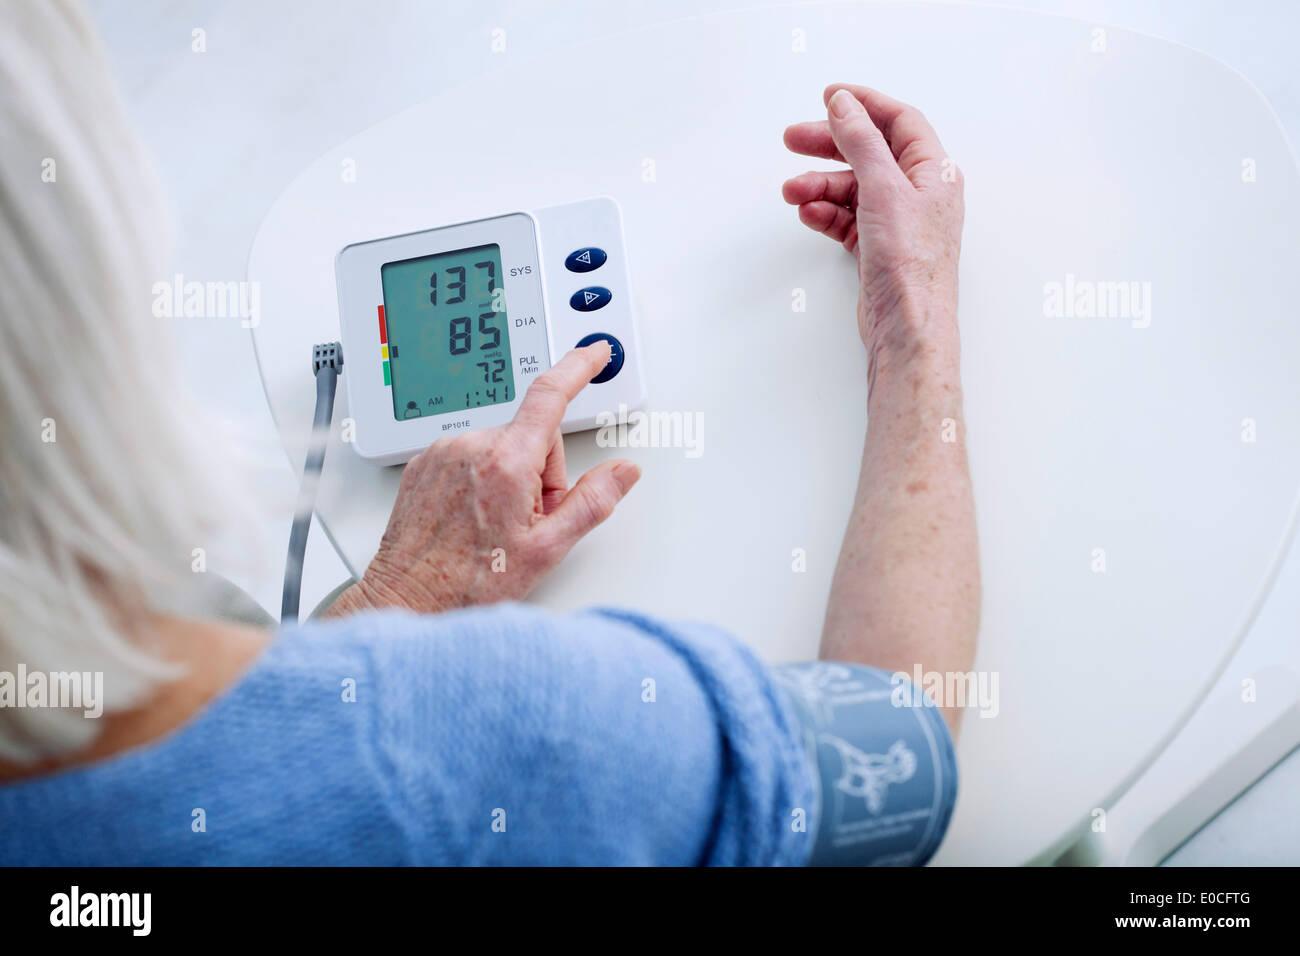 Blood pressure, elderly person - Stock Image